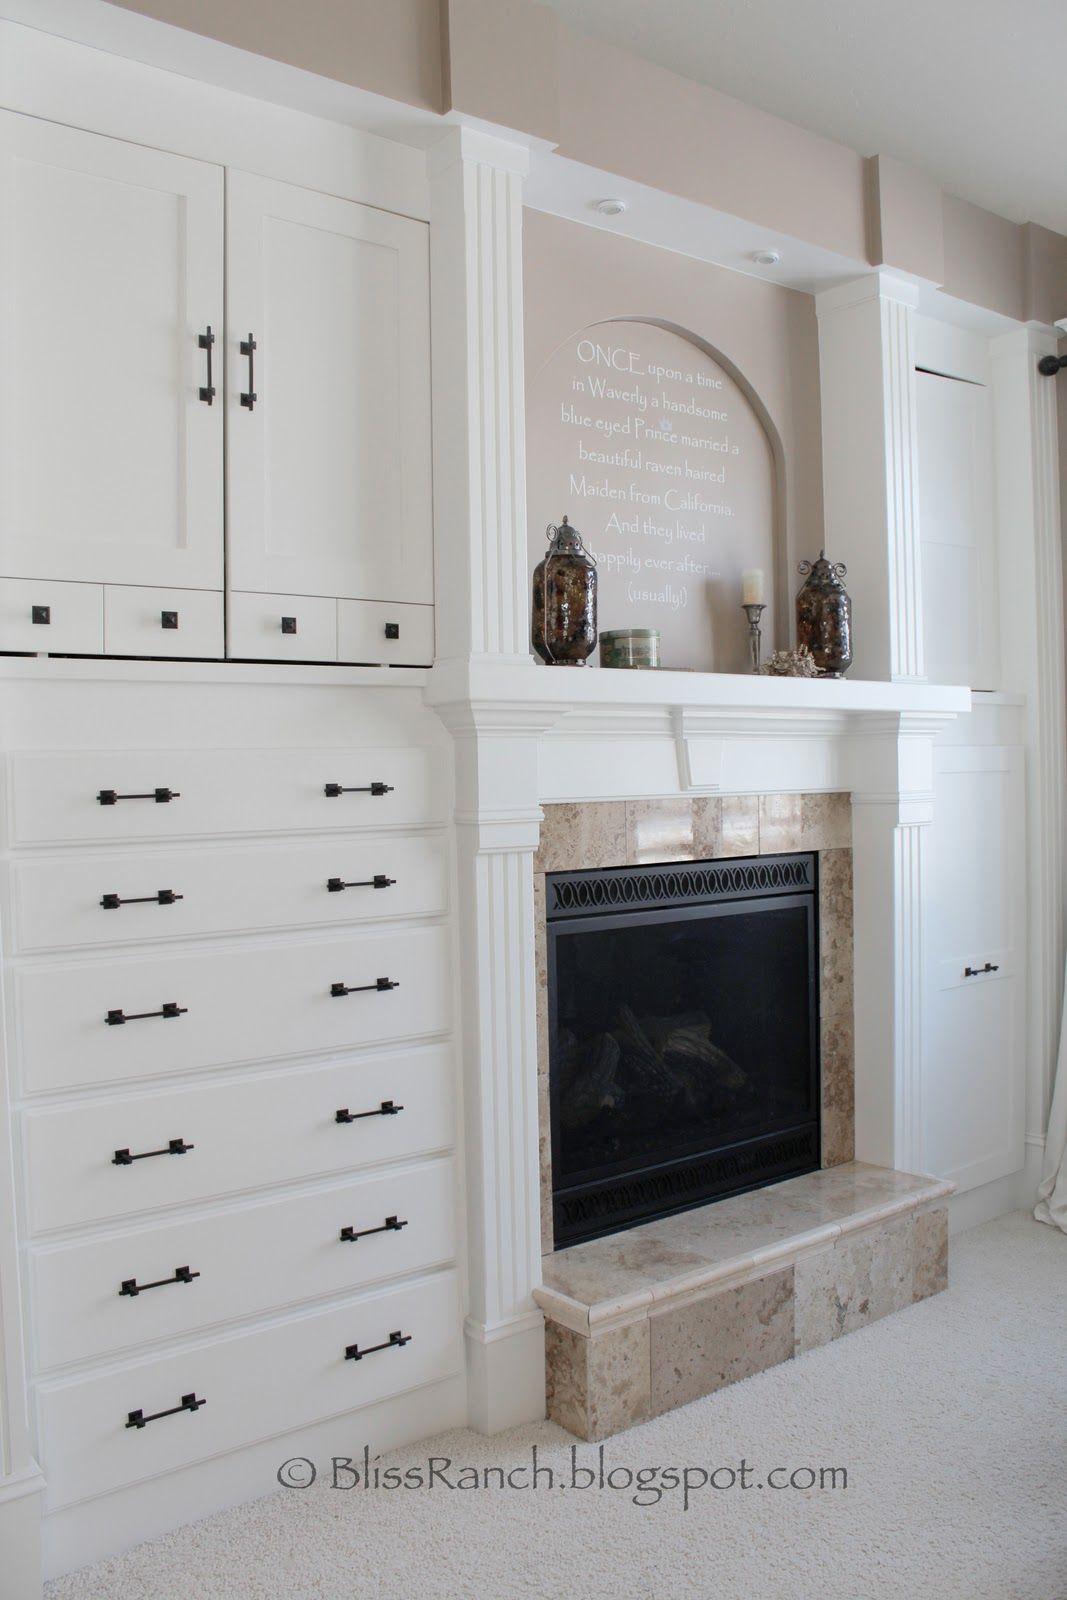 Best Bedroom Built In Dresser More Drawers Instead Of The 400 x 300